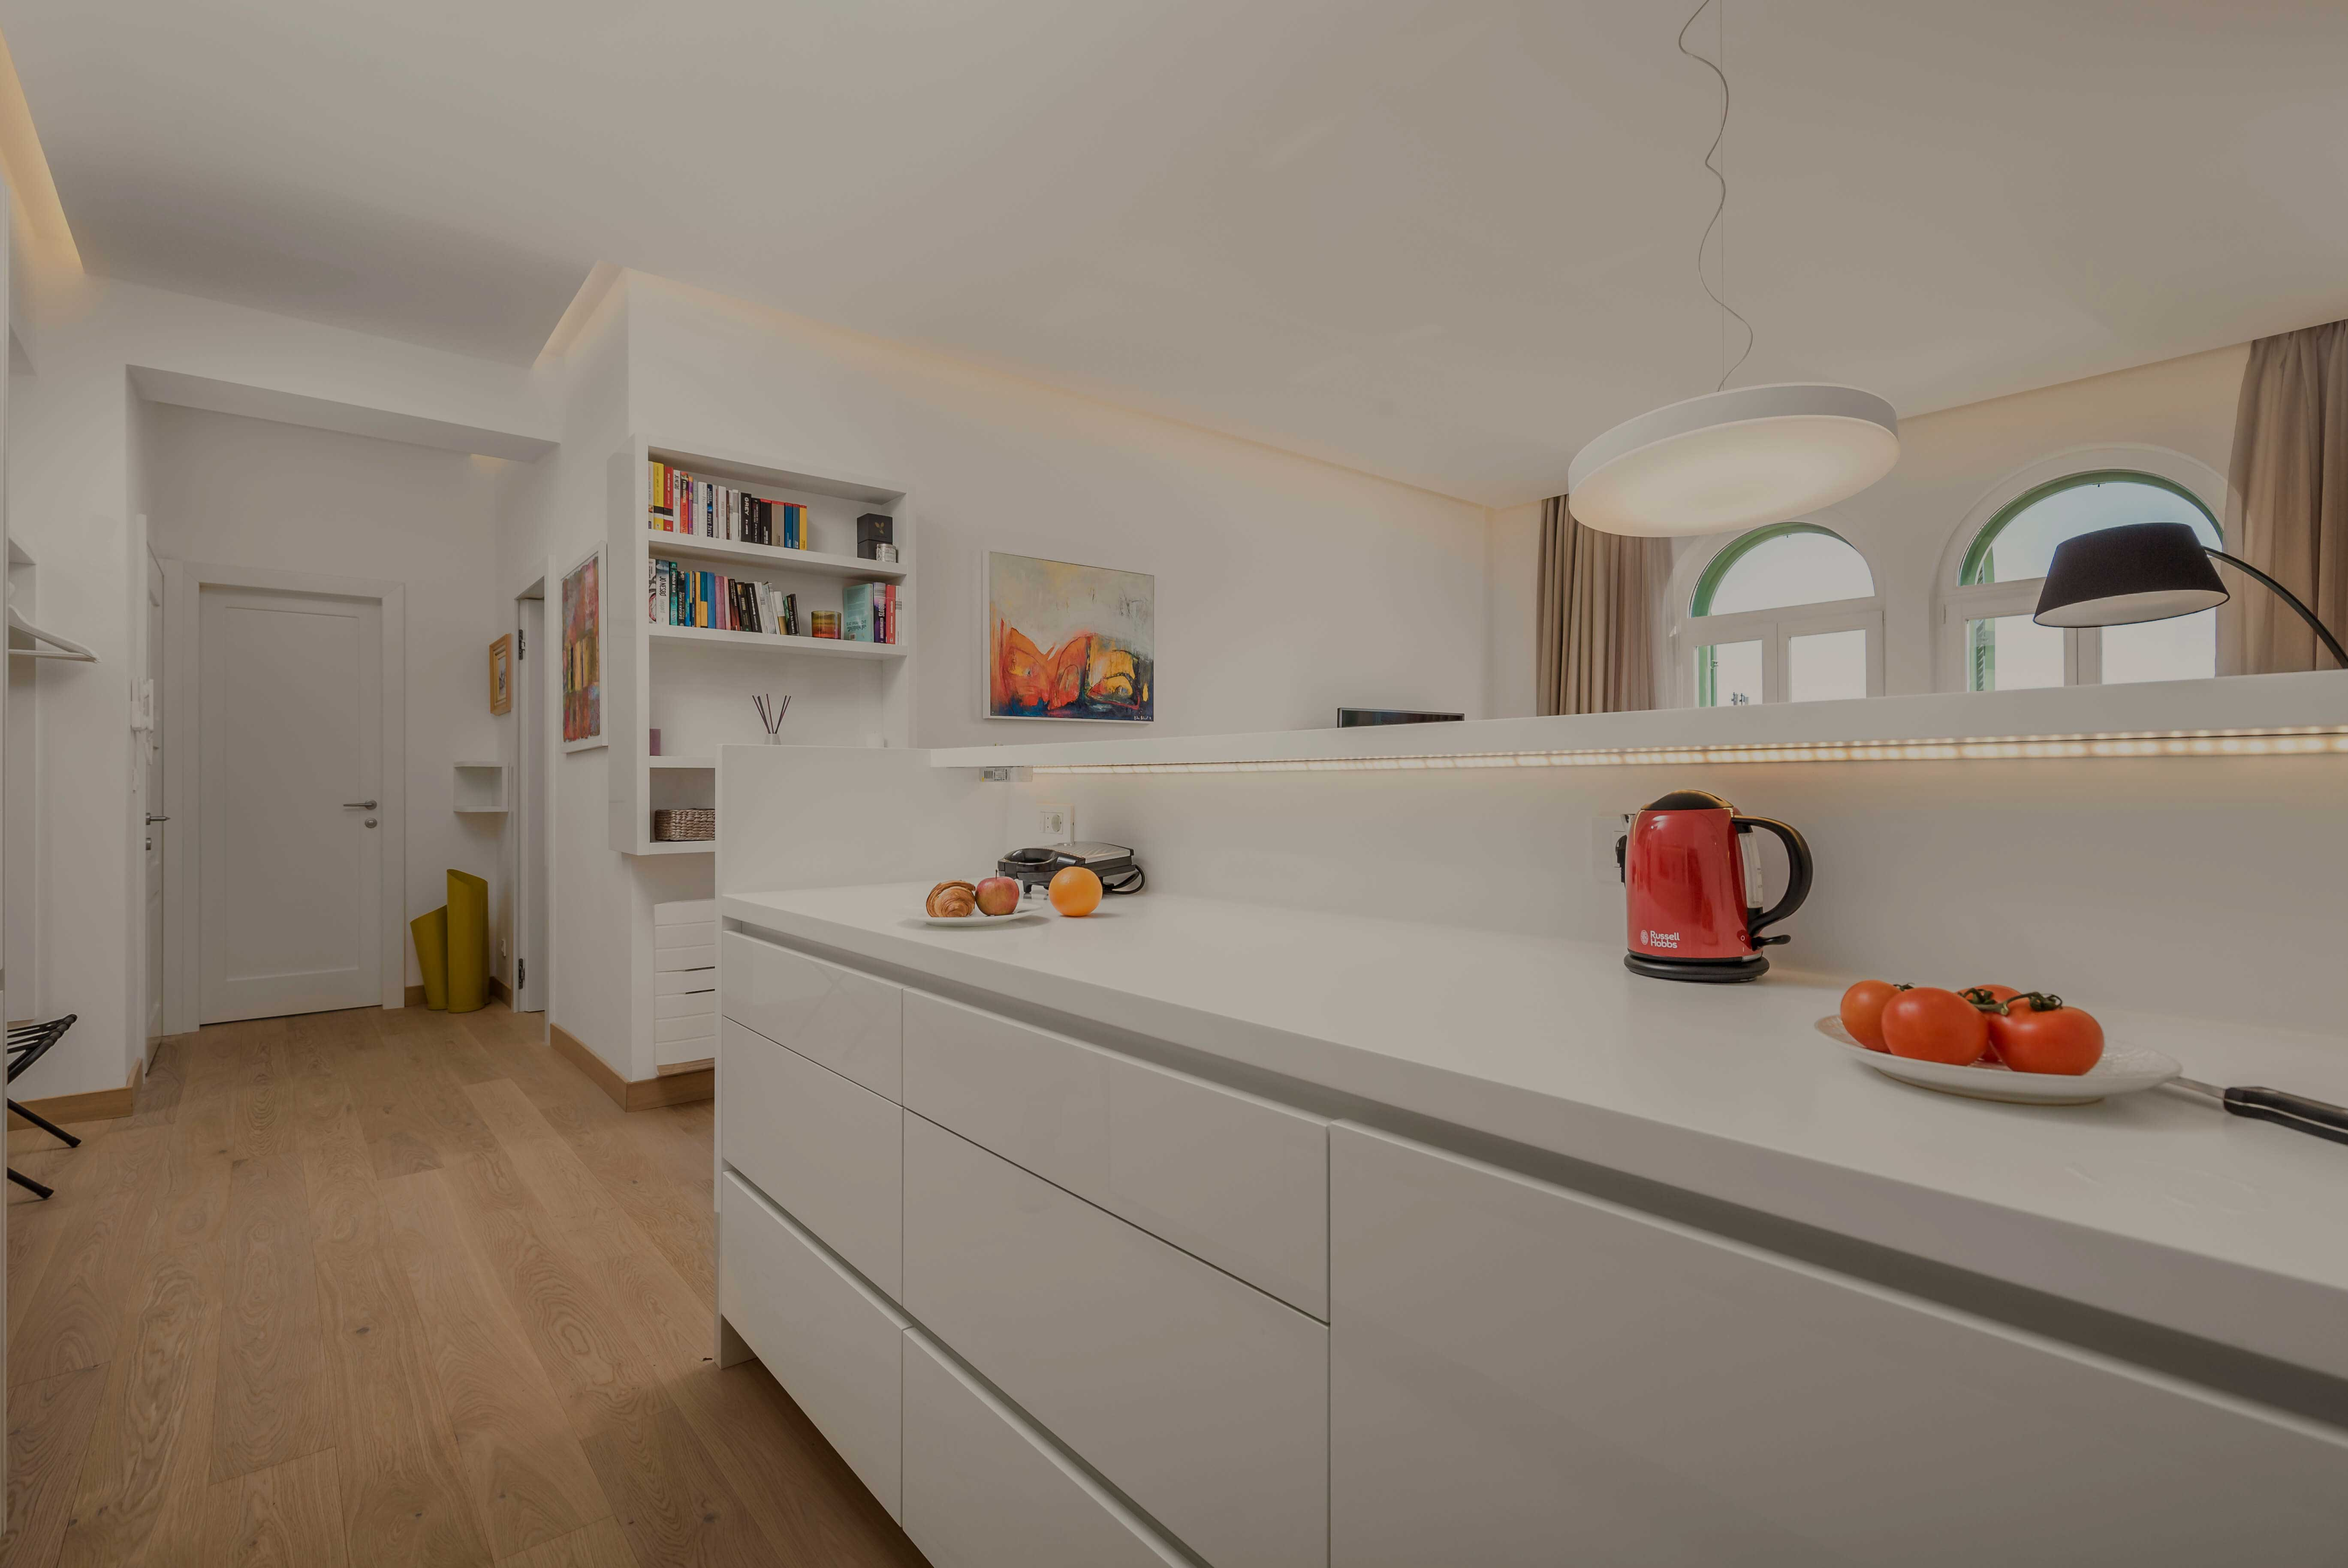 kuhinja, bijela kuhinja, apartman OLA, luksuzni apartman, opatija, kvarner, hrvatska